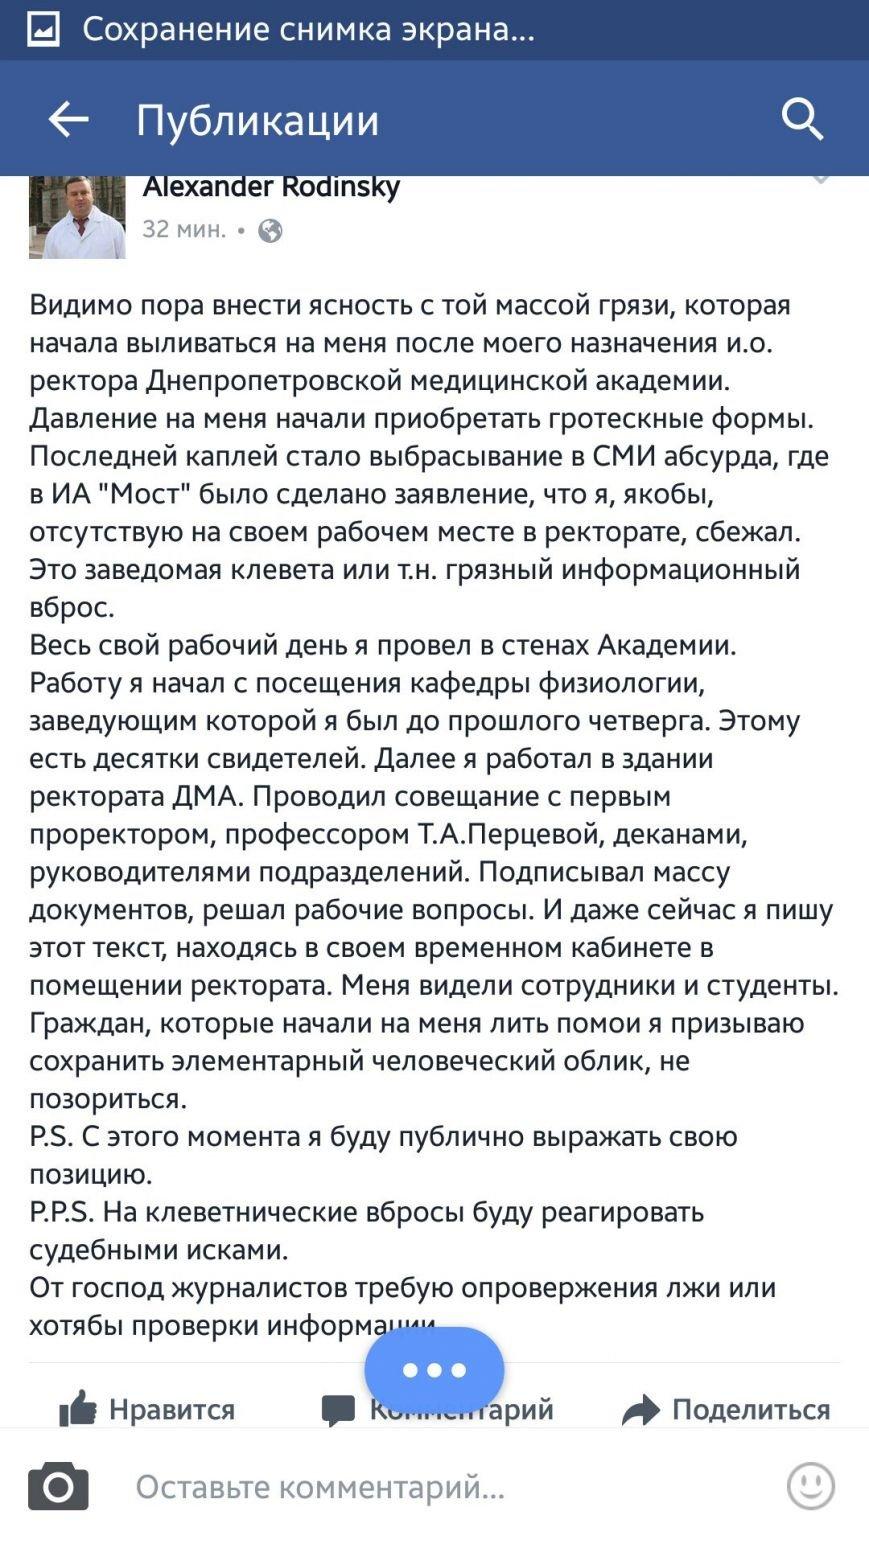 "Скандал в Медакадемии: объявился ""пропавший"" Родинский (ФОТО), фото-1"